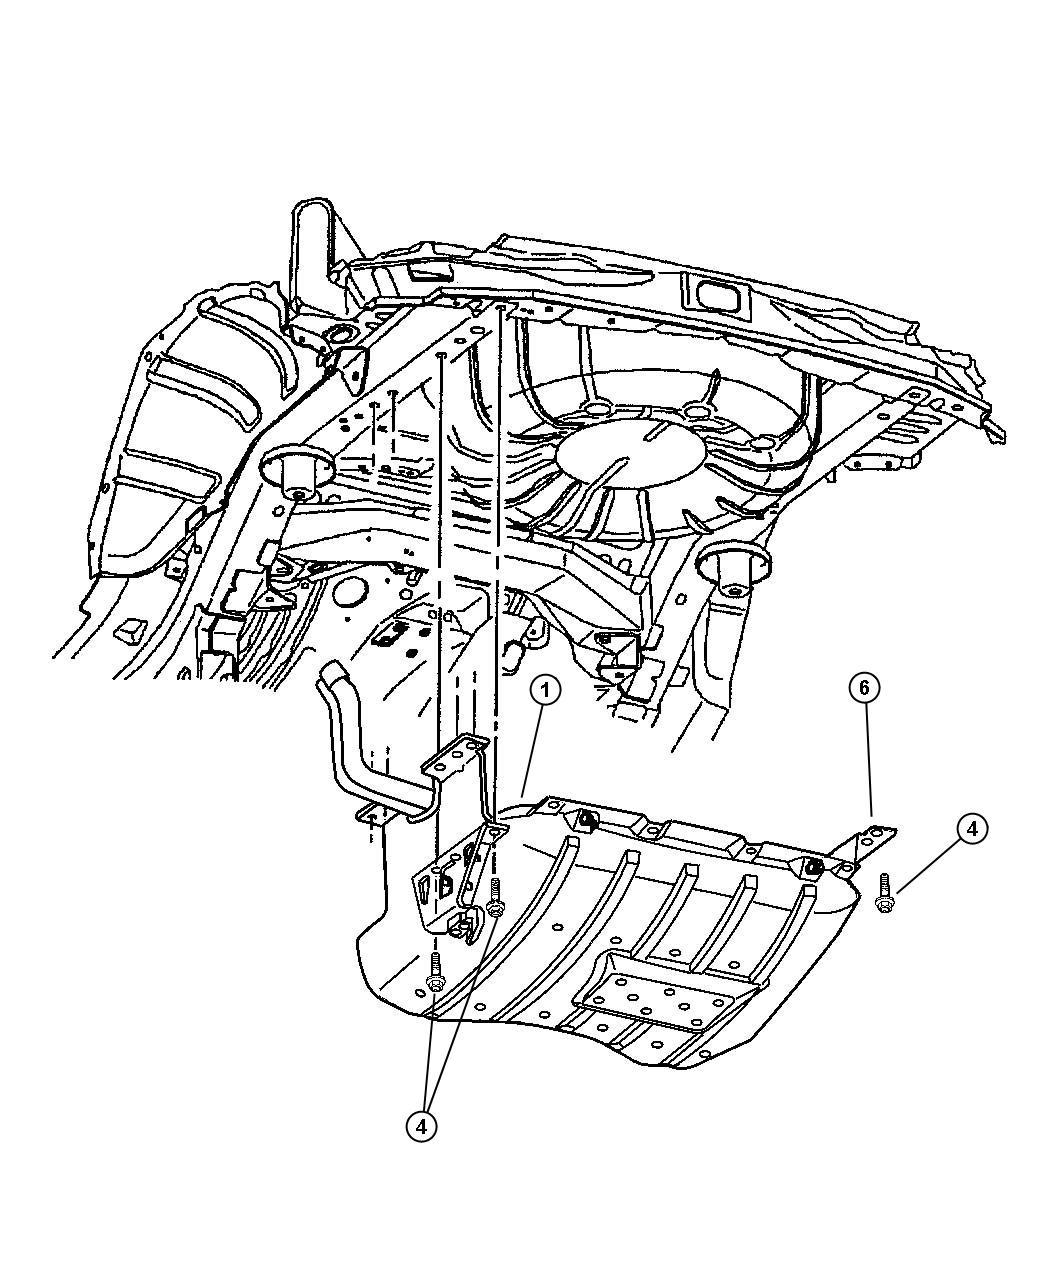 Dodge Sprinter Tank Fuel